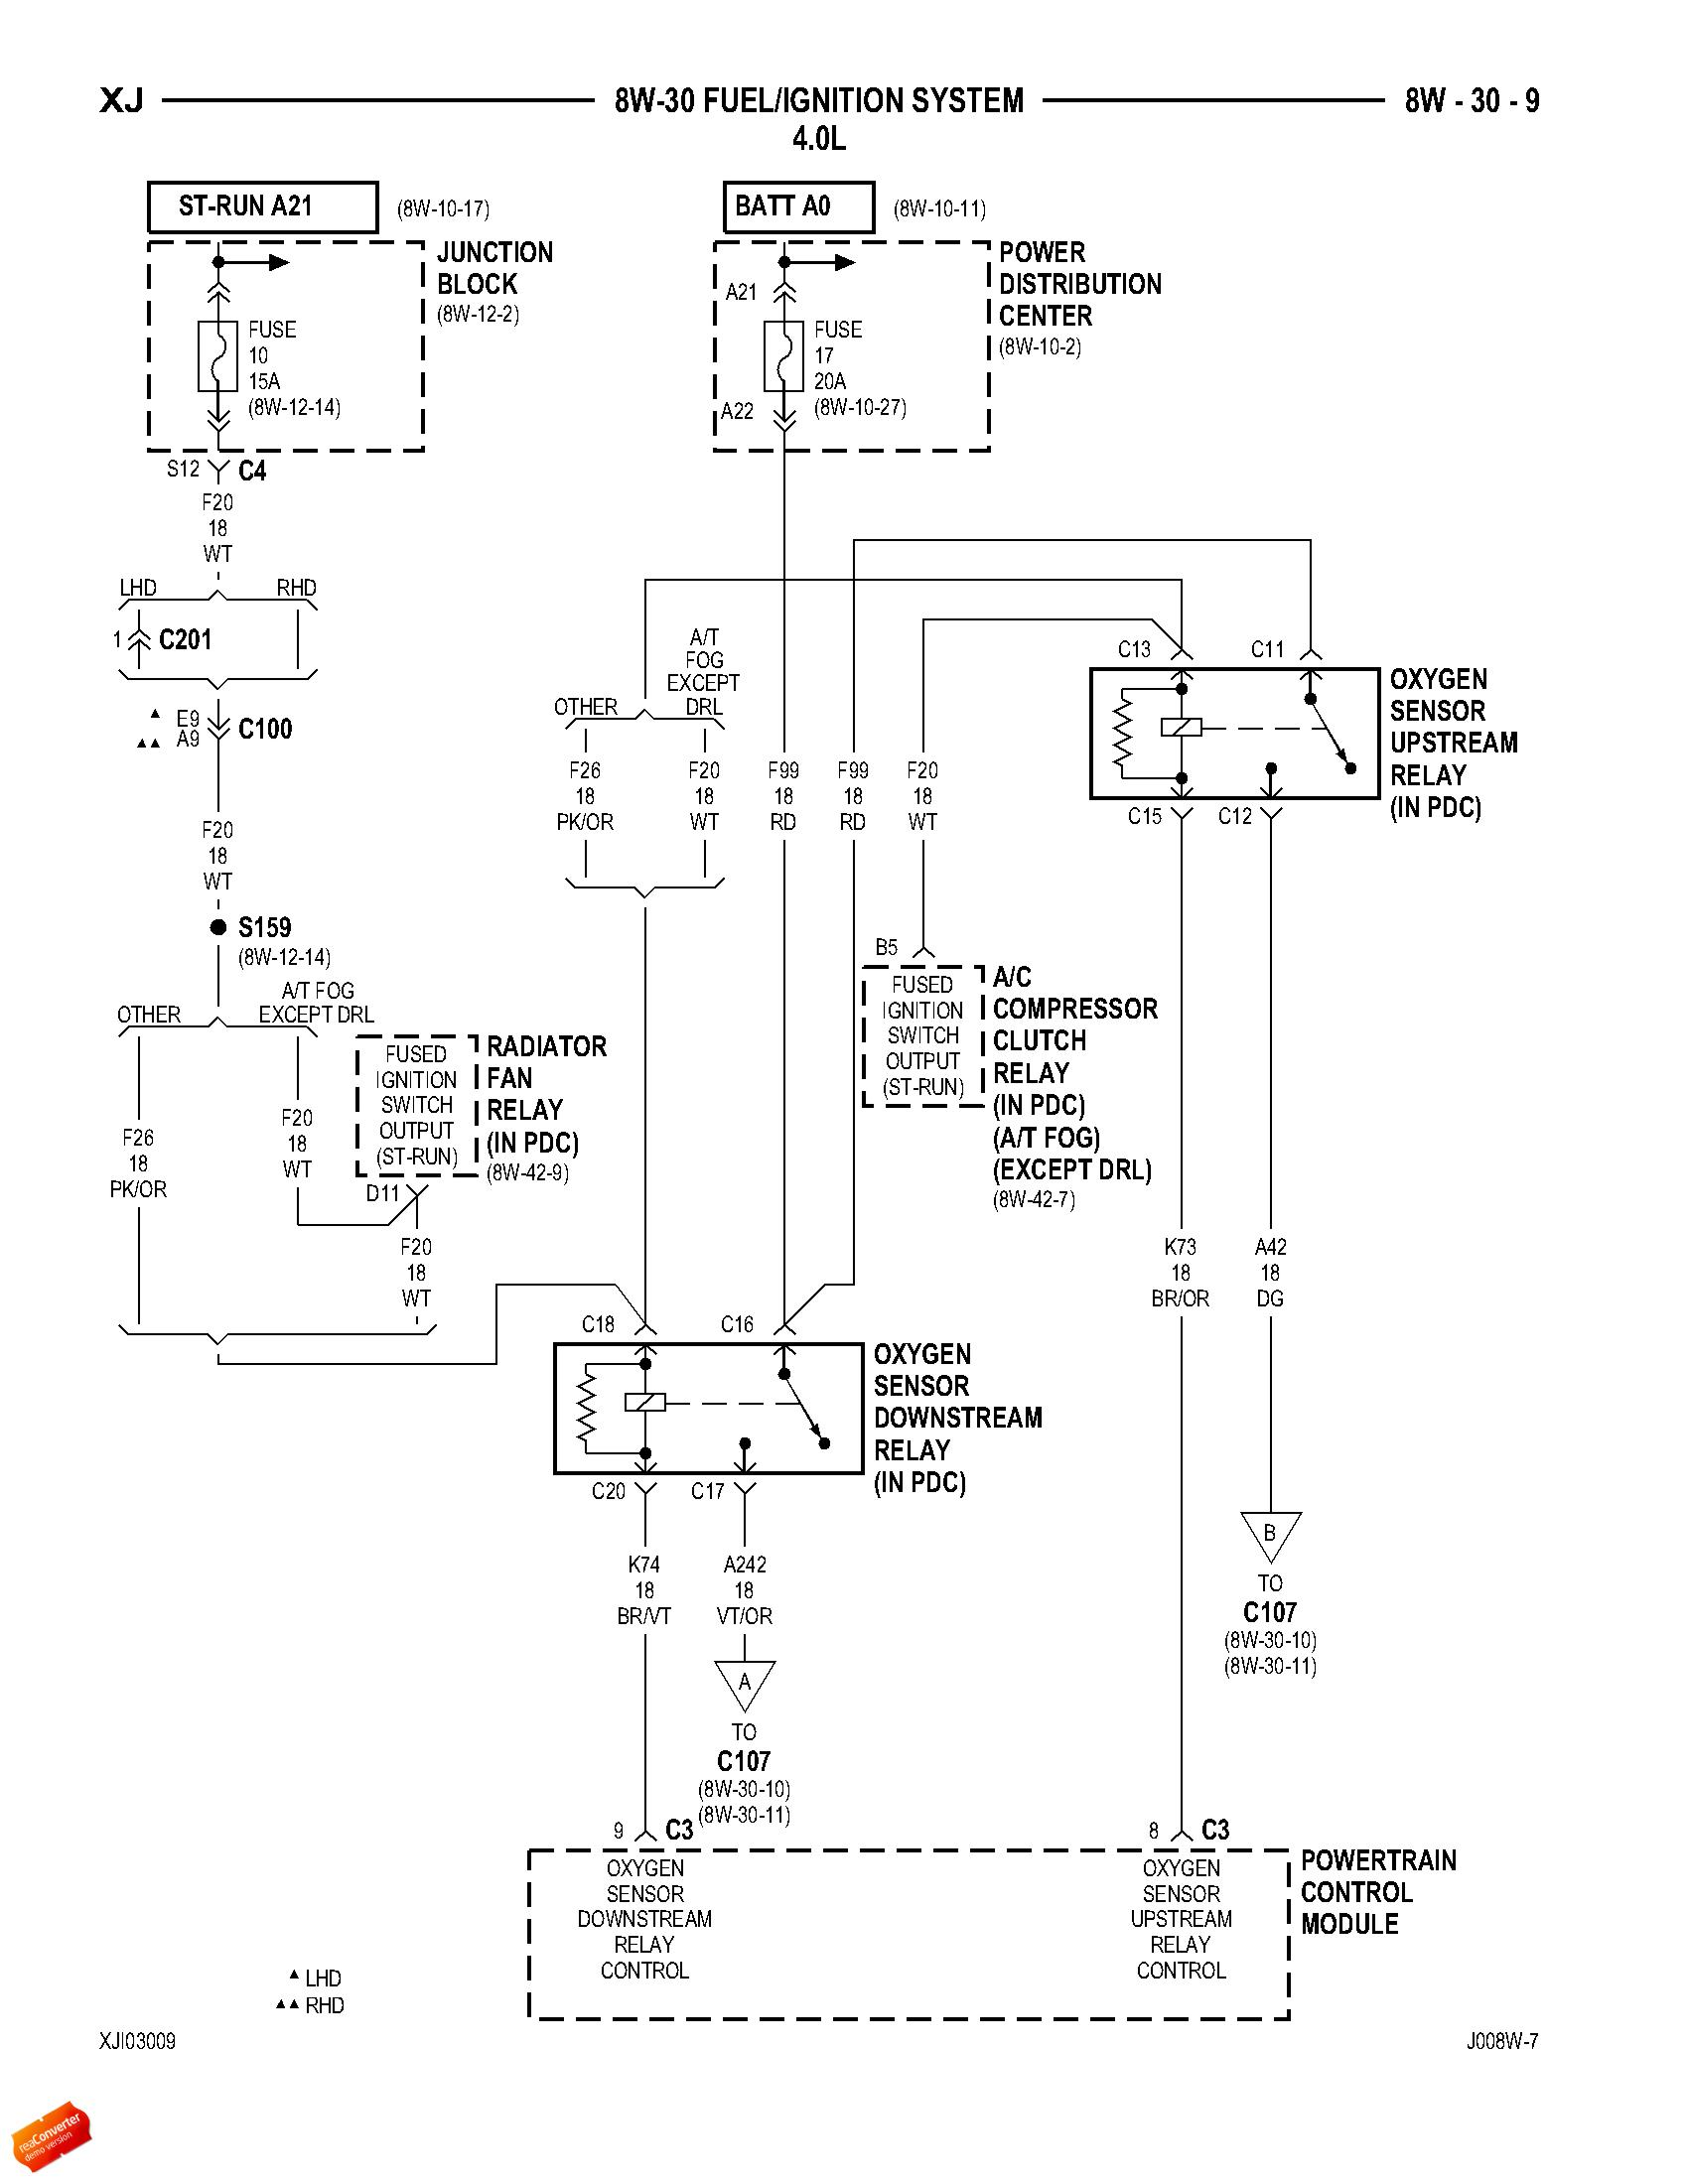 Swell Bmw X5 O2 Sensor Diagram Wiring Diagram Data Schema Wiring Cloud Inklaidewilluminateatxorg